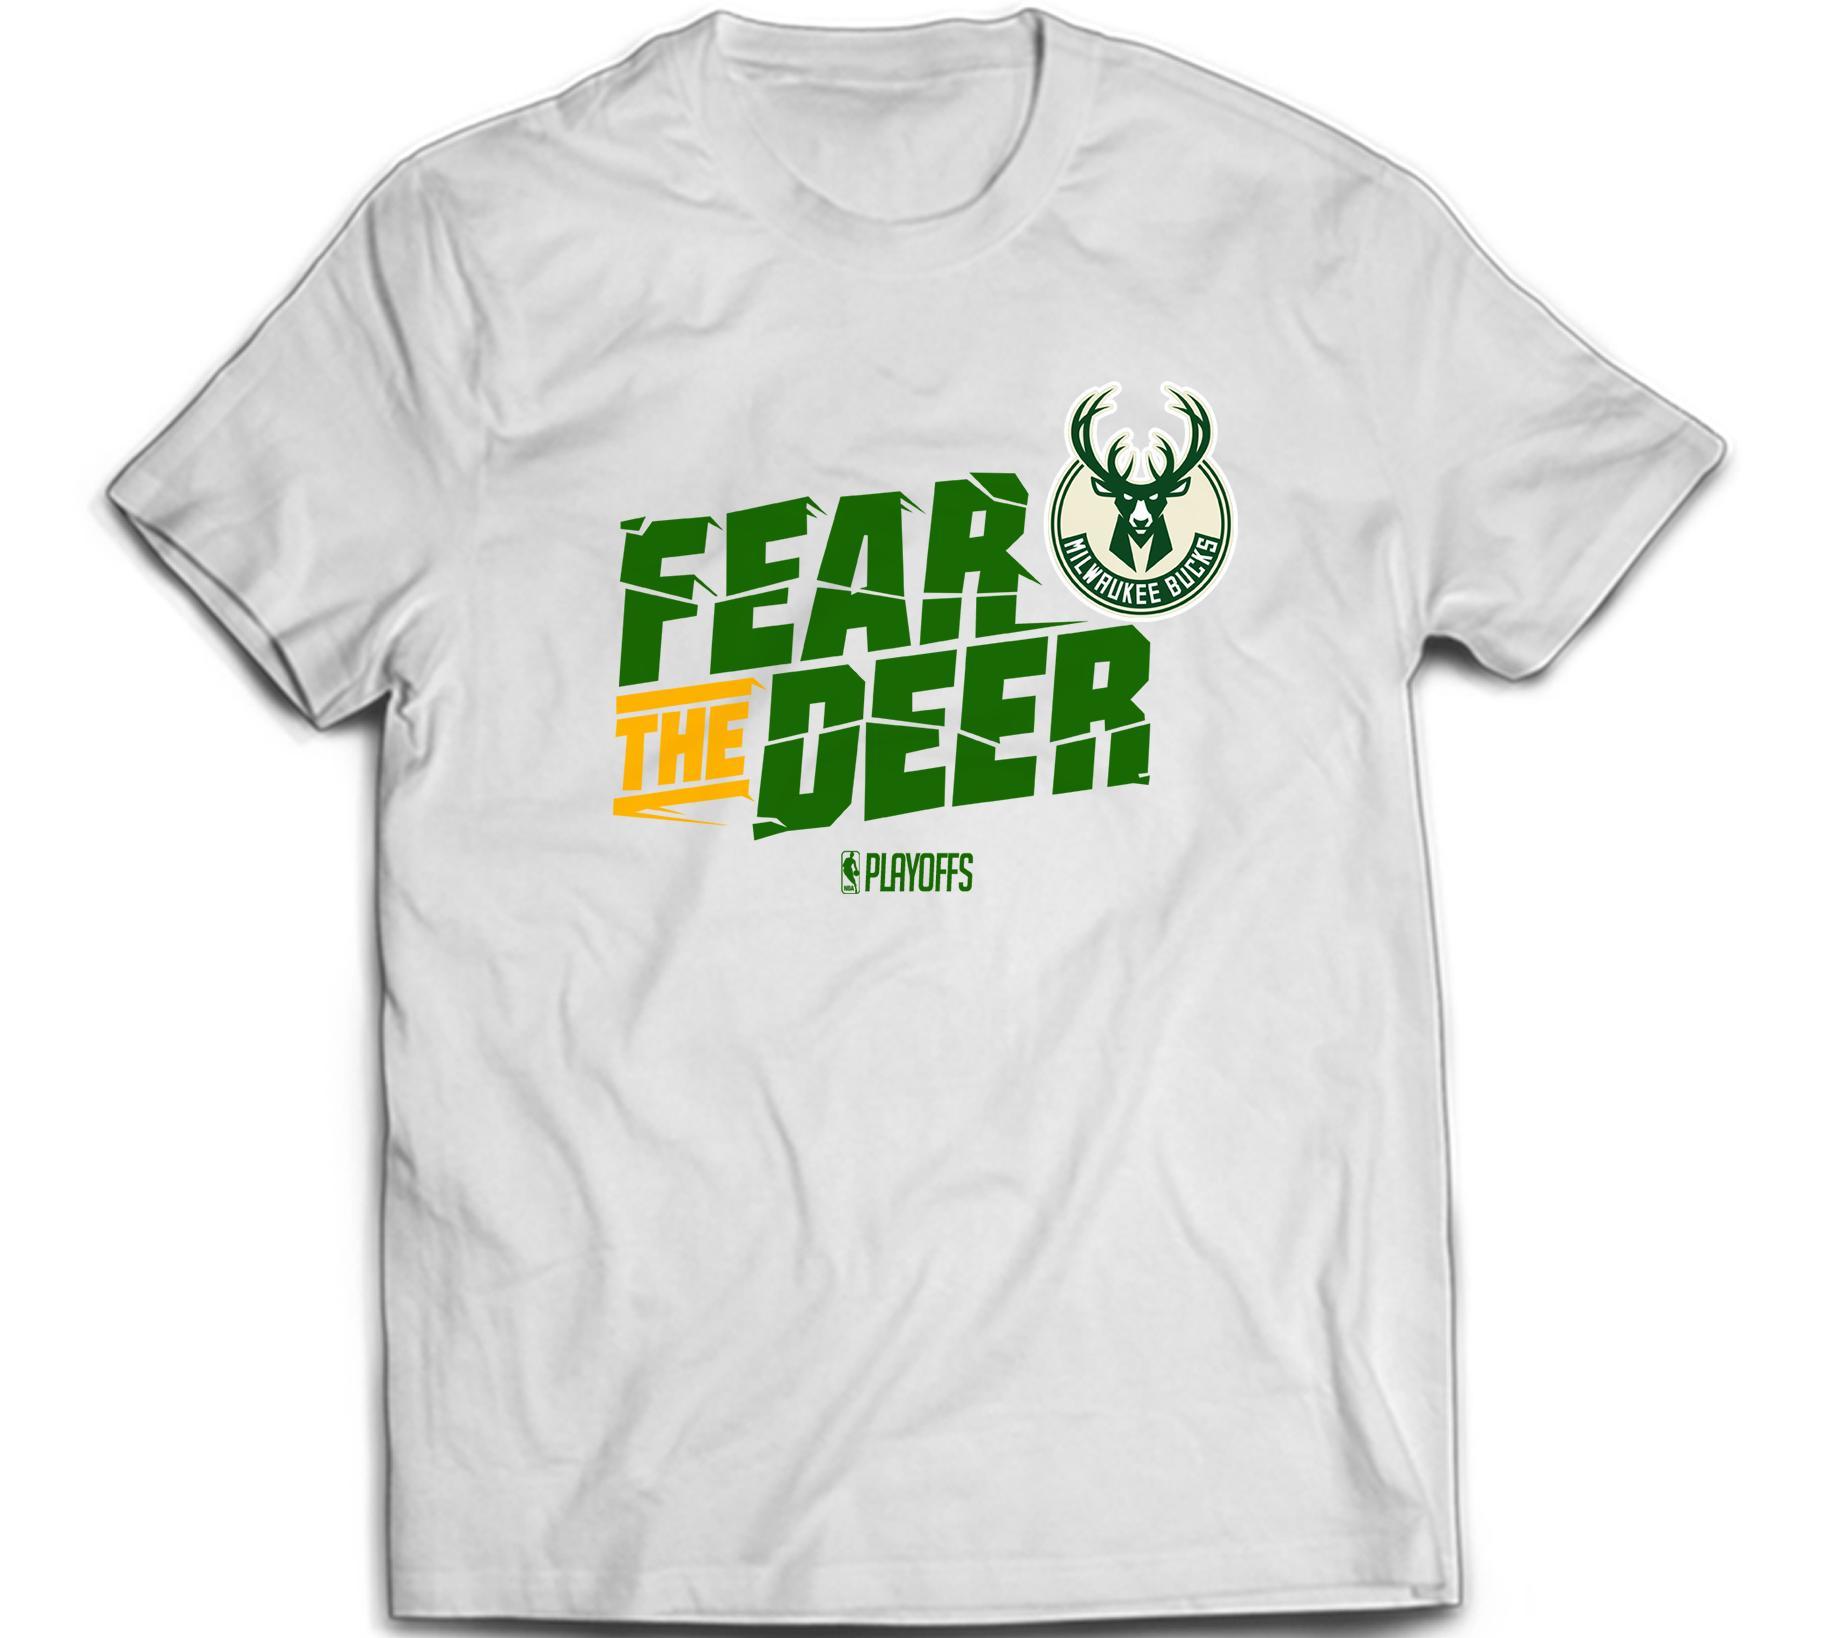 b53275e92 Custom Basketball Shirt for sale - Basketball Fan Shirt online ...